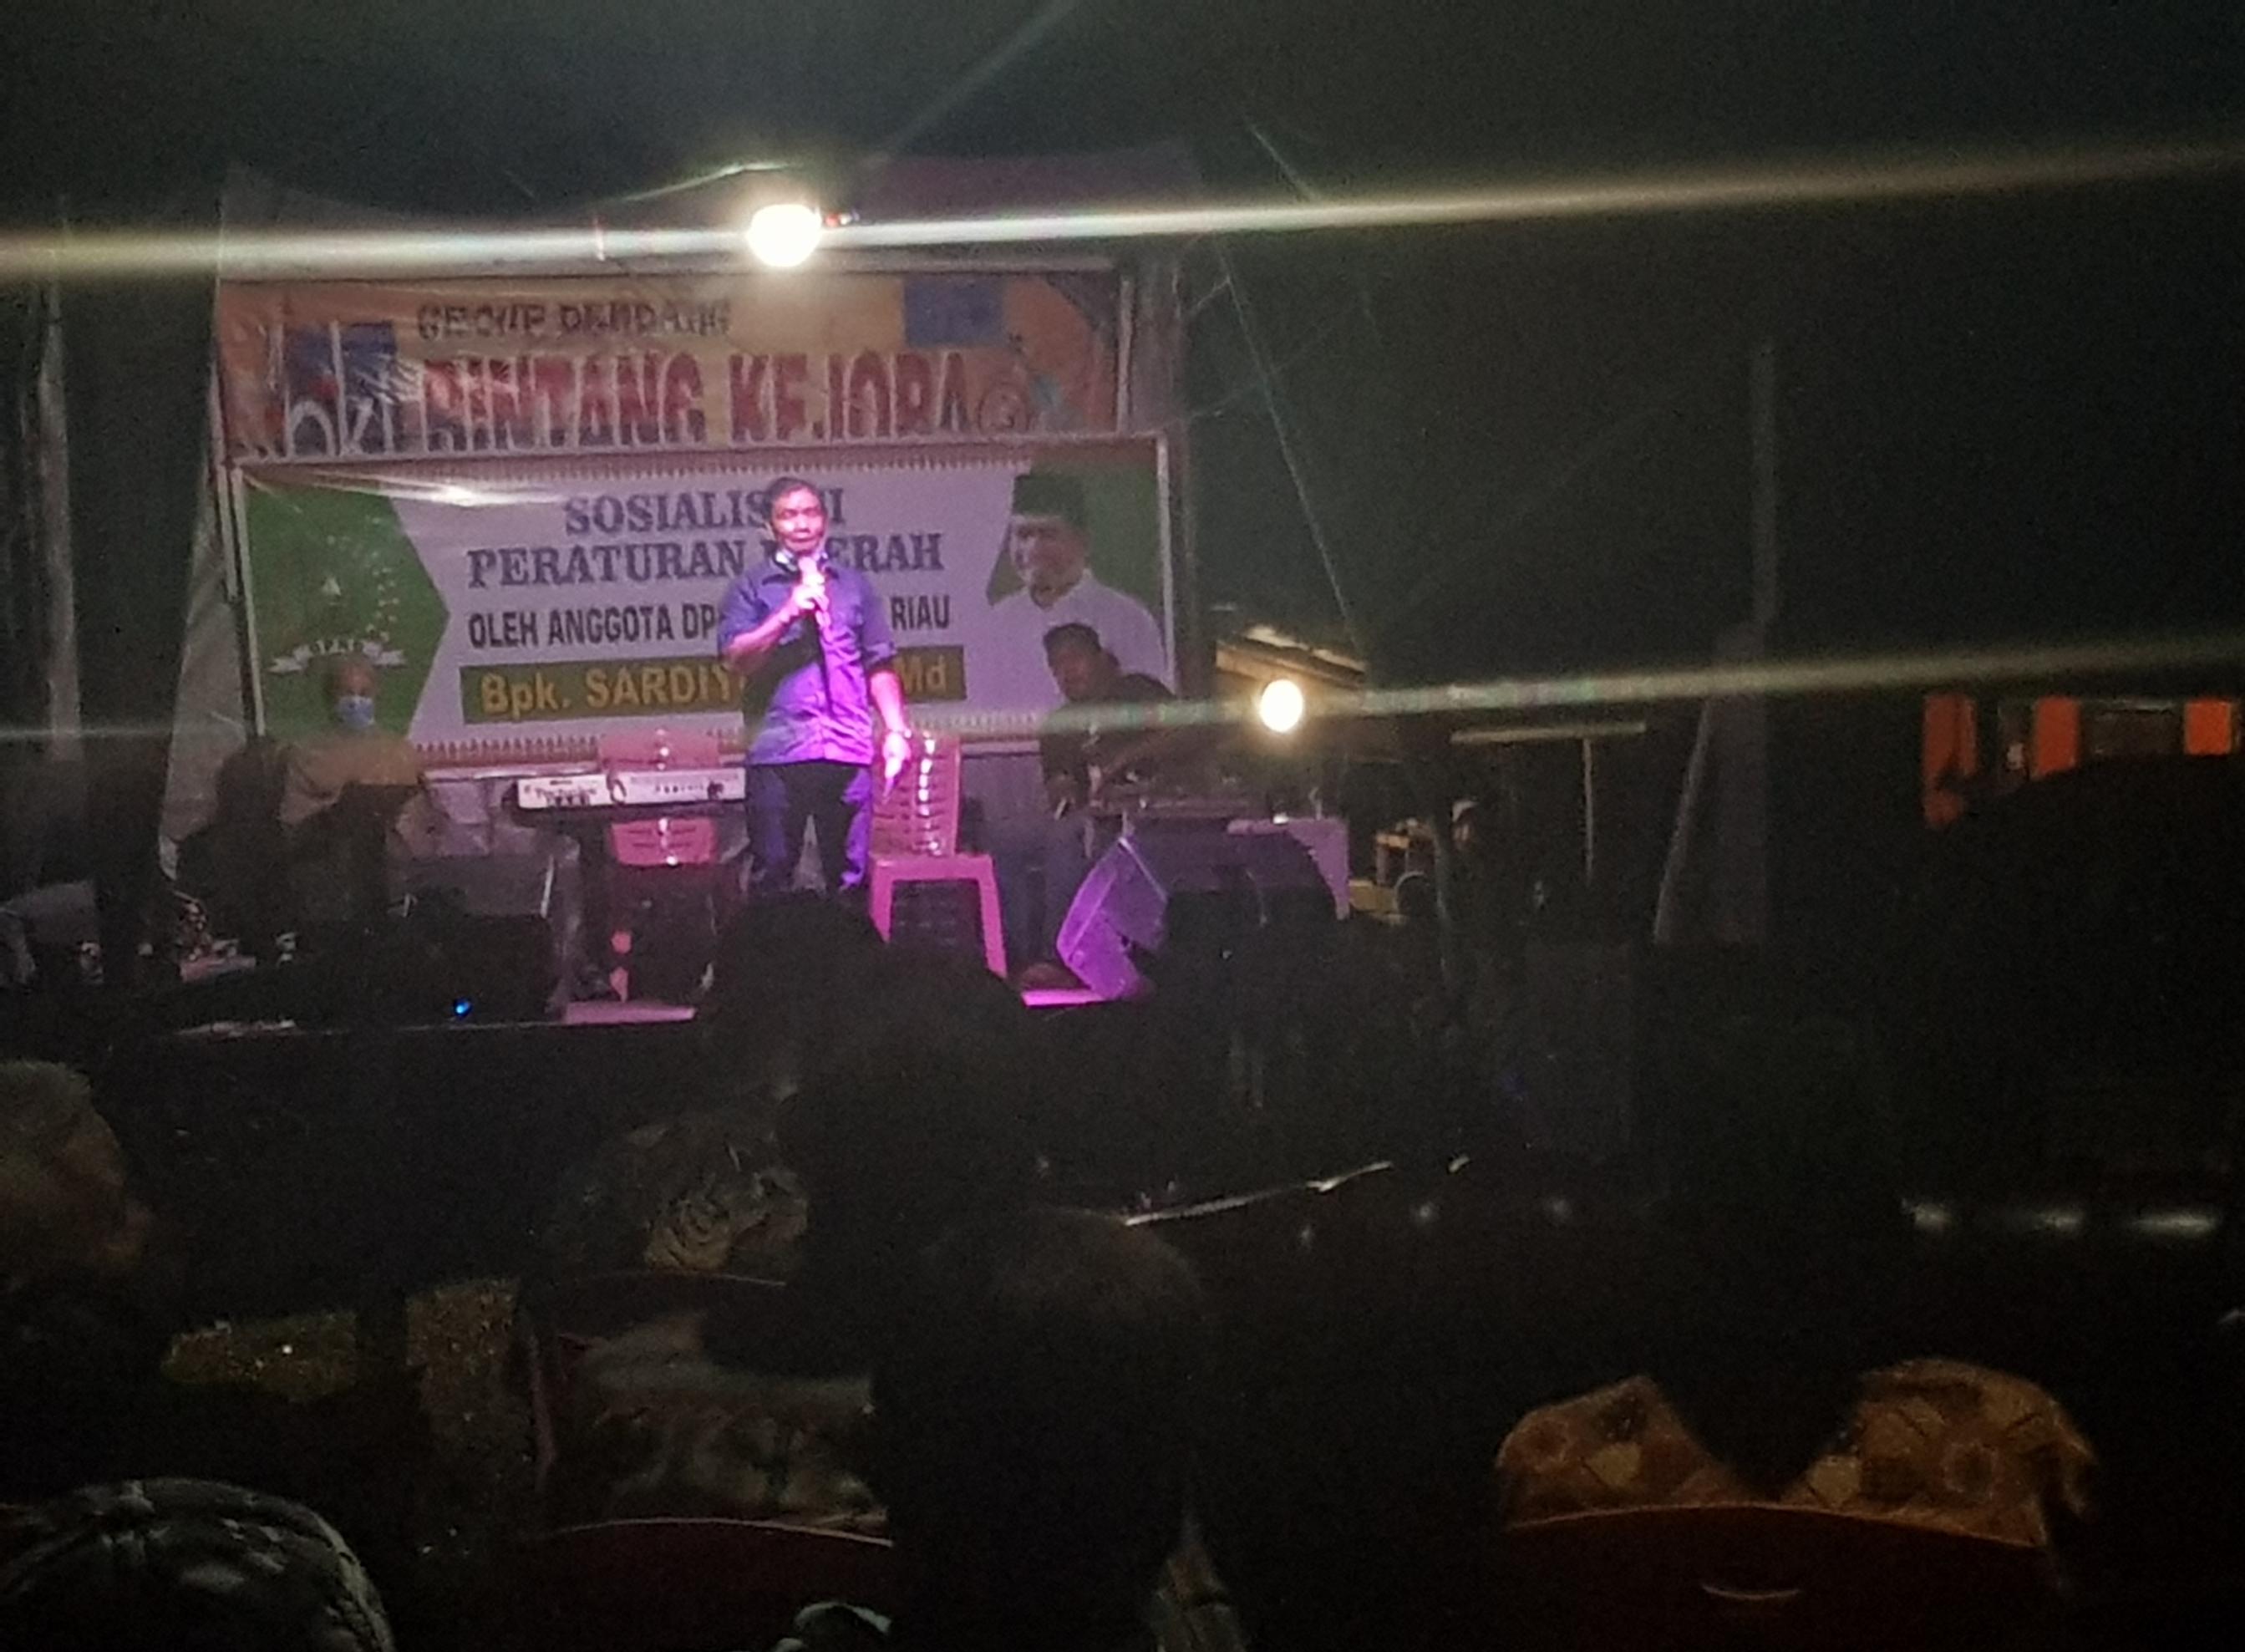 Anggota DPRD Riau Sardiyono Sosialisasikan Pentingnya Perda Untuk Kabupaten